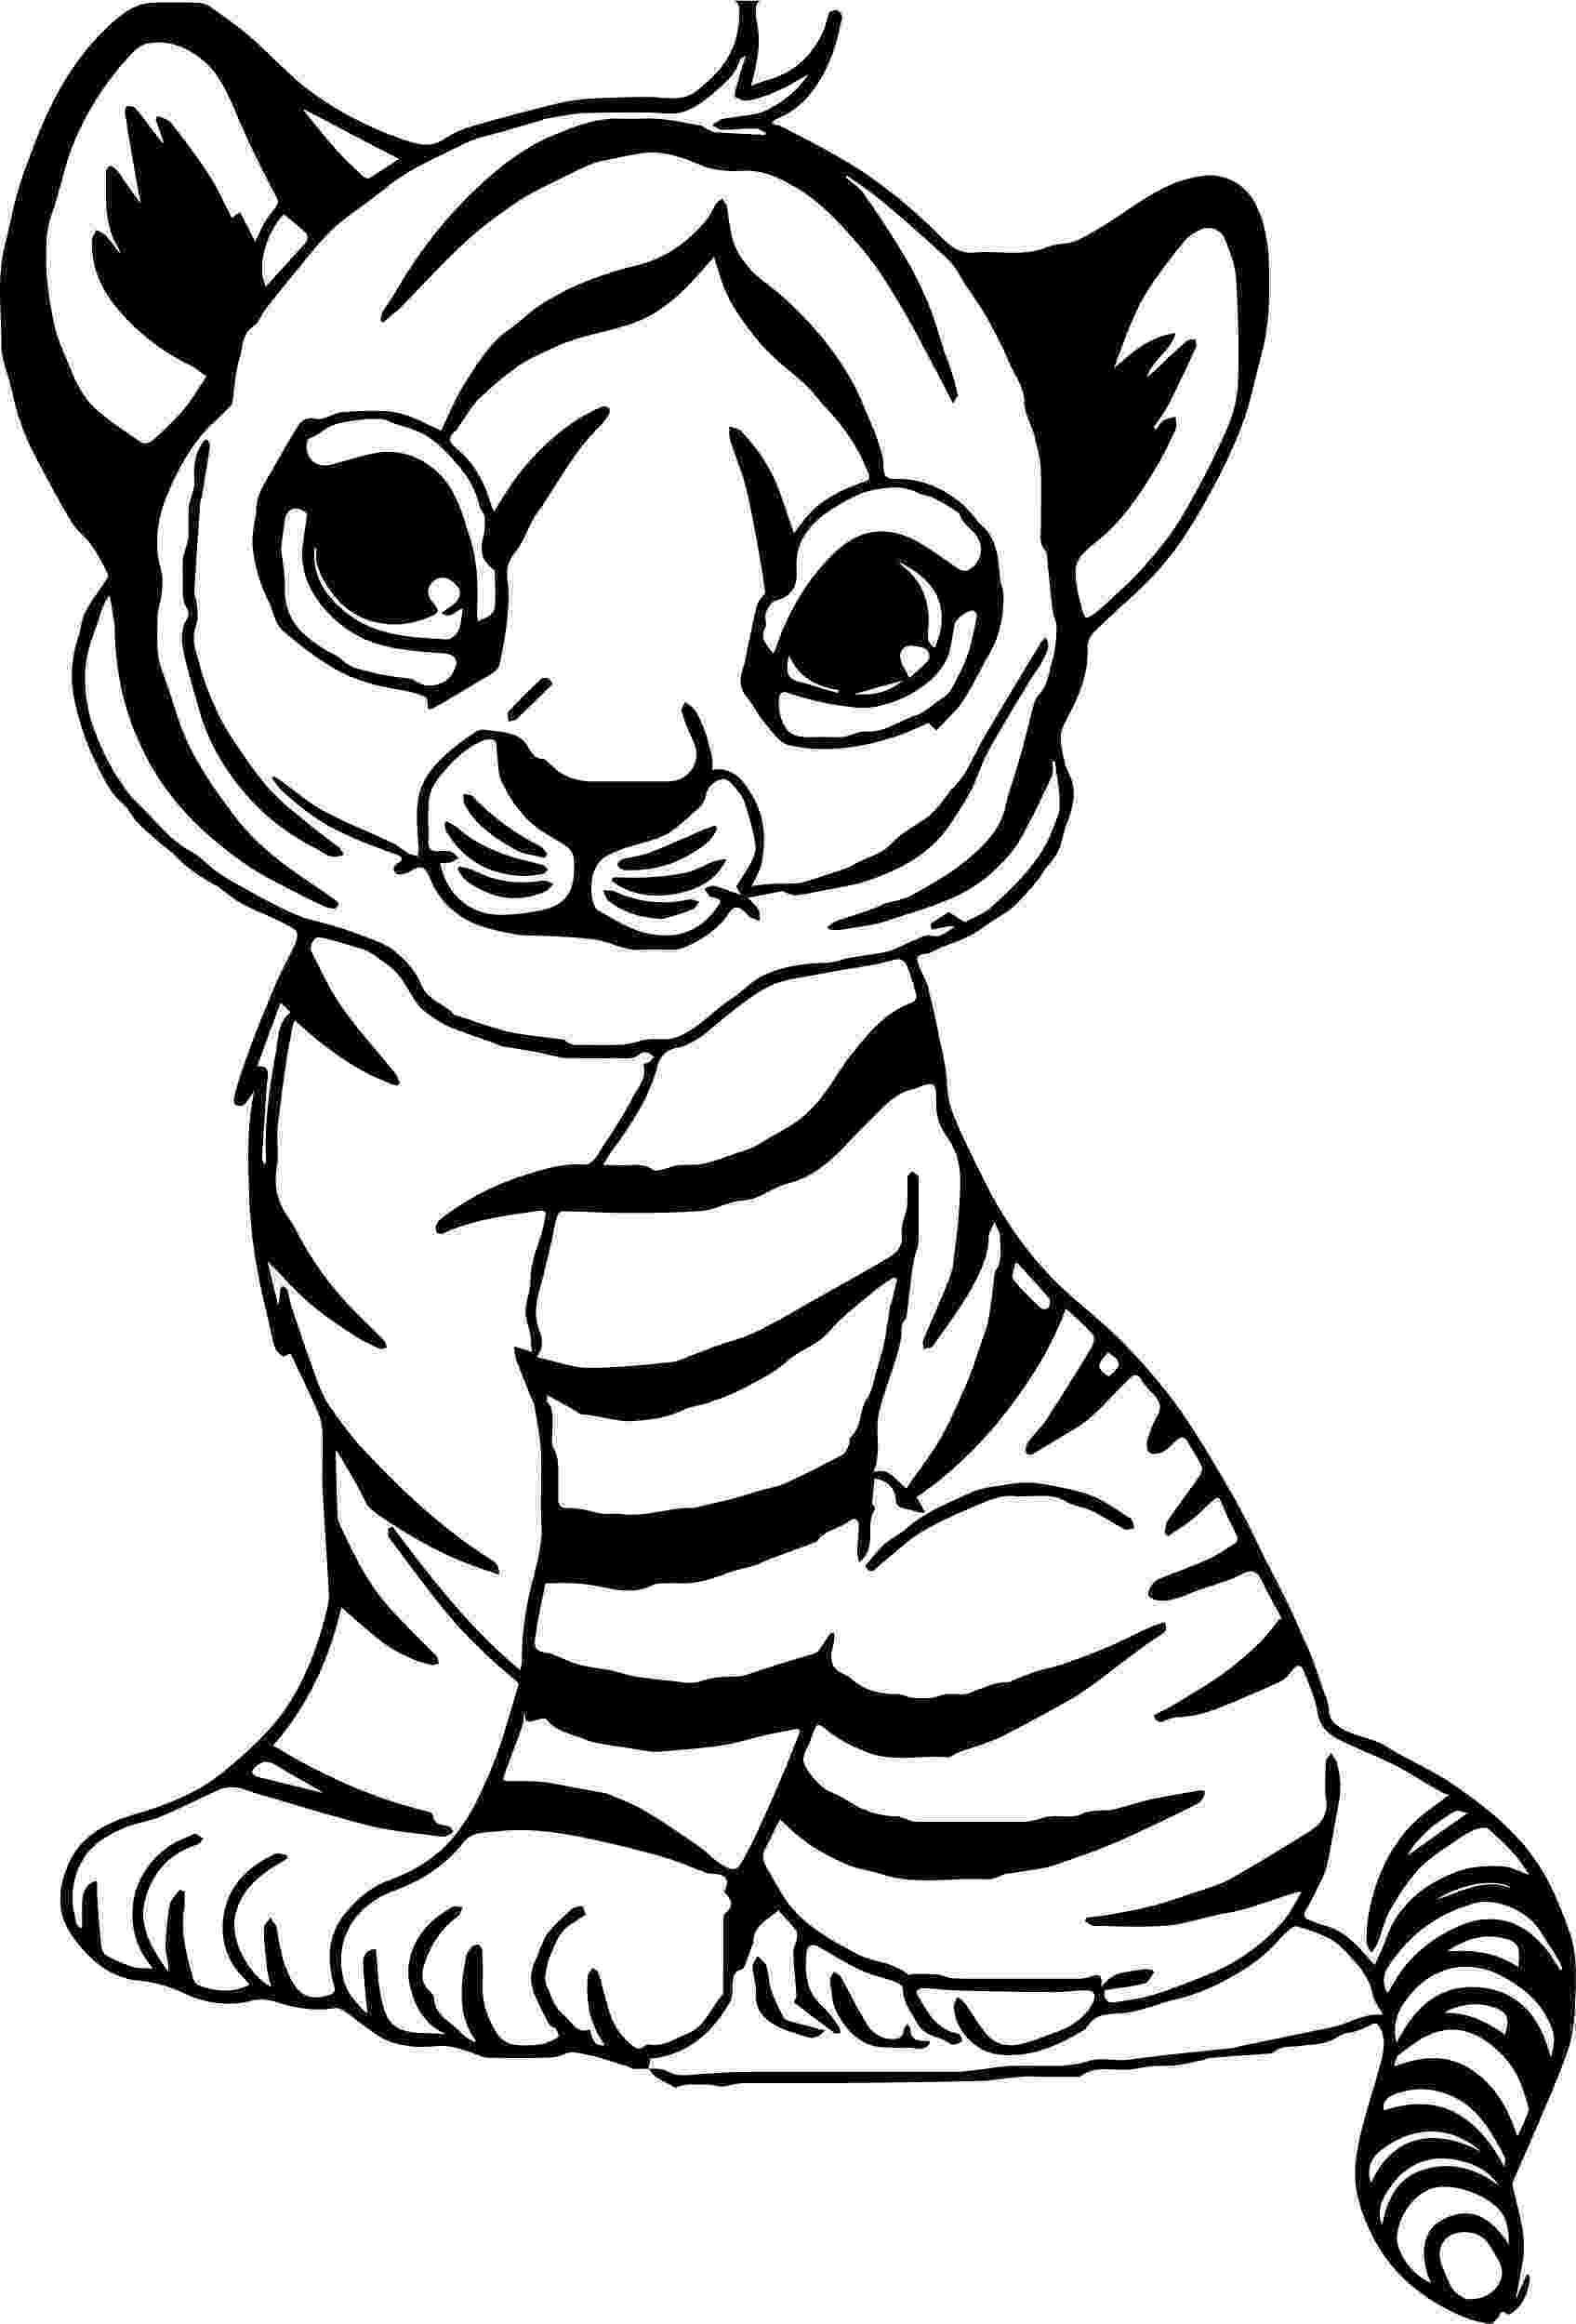 tiger printable nice cute baby tiger coloring page zoo animals baby tiger printable